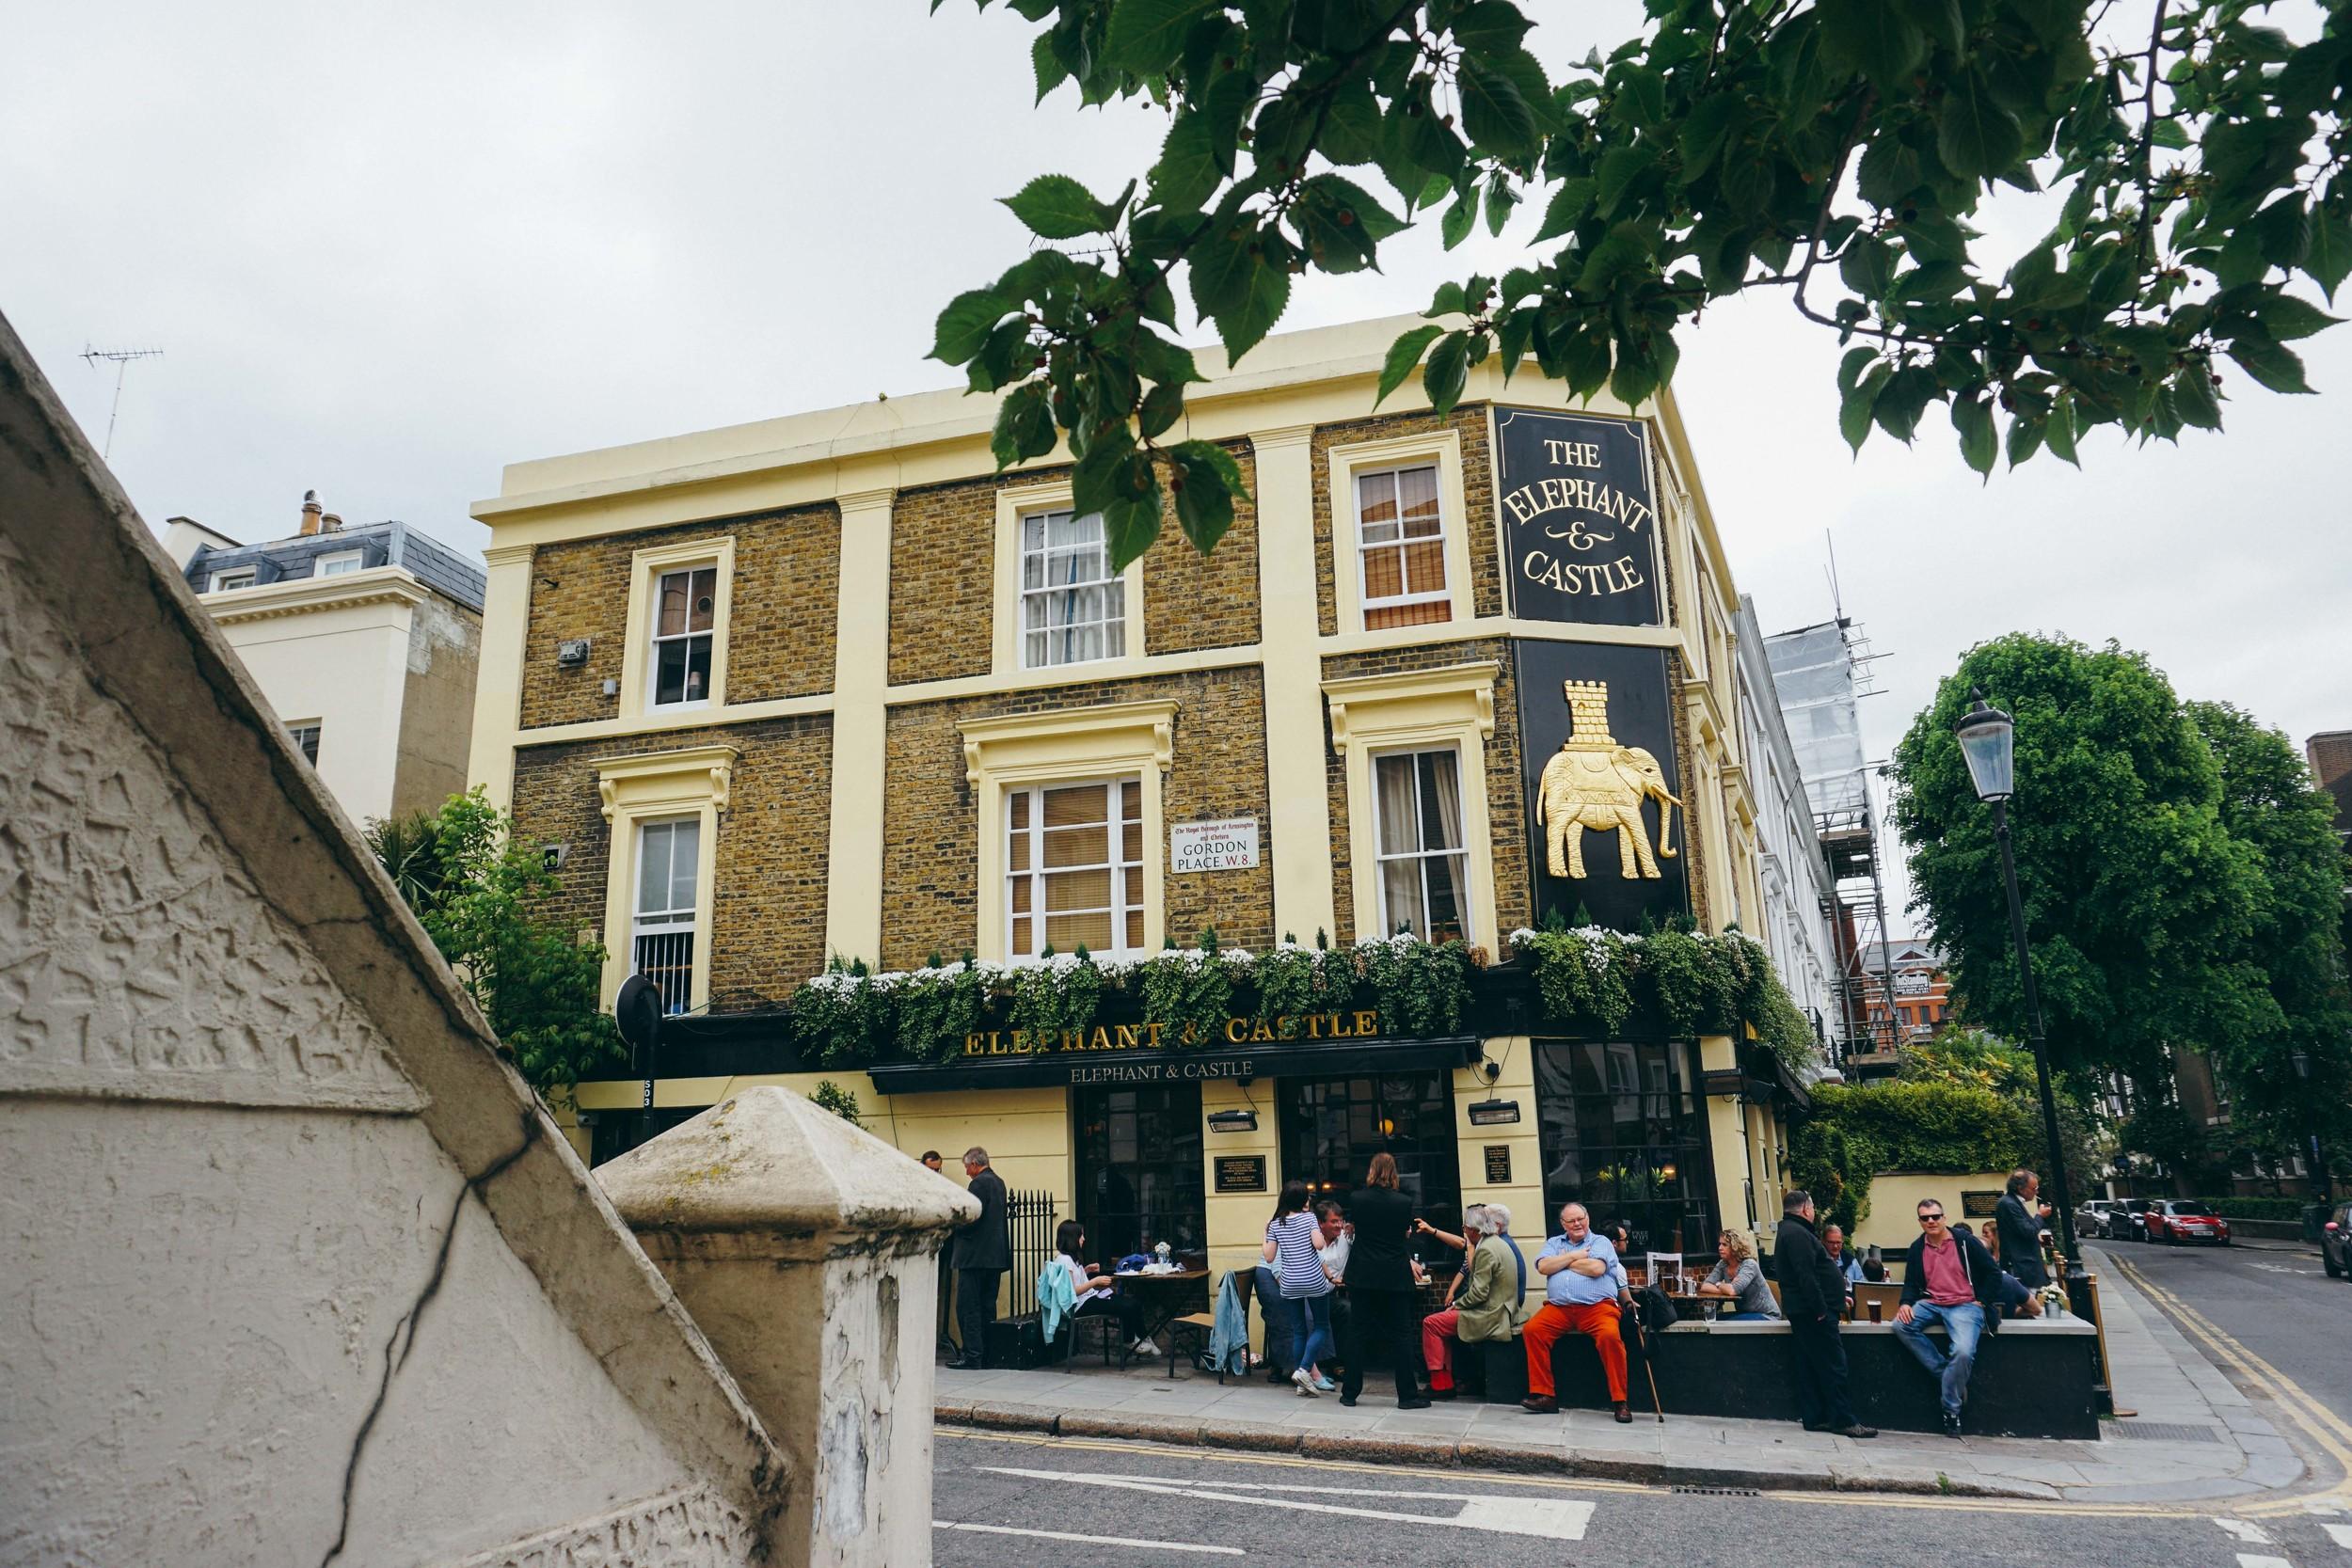 Elephant & Castle pub in Kensington